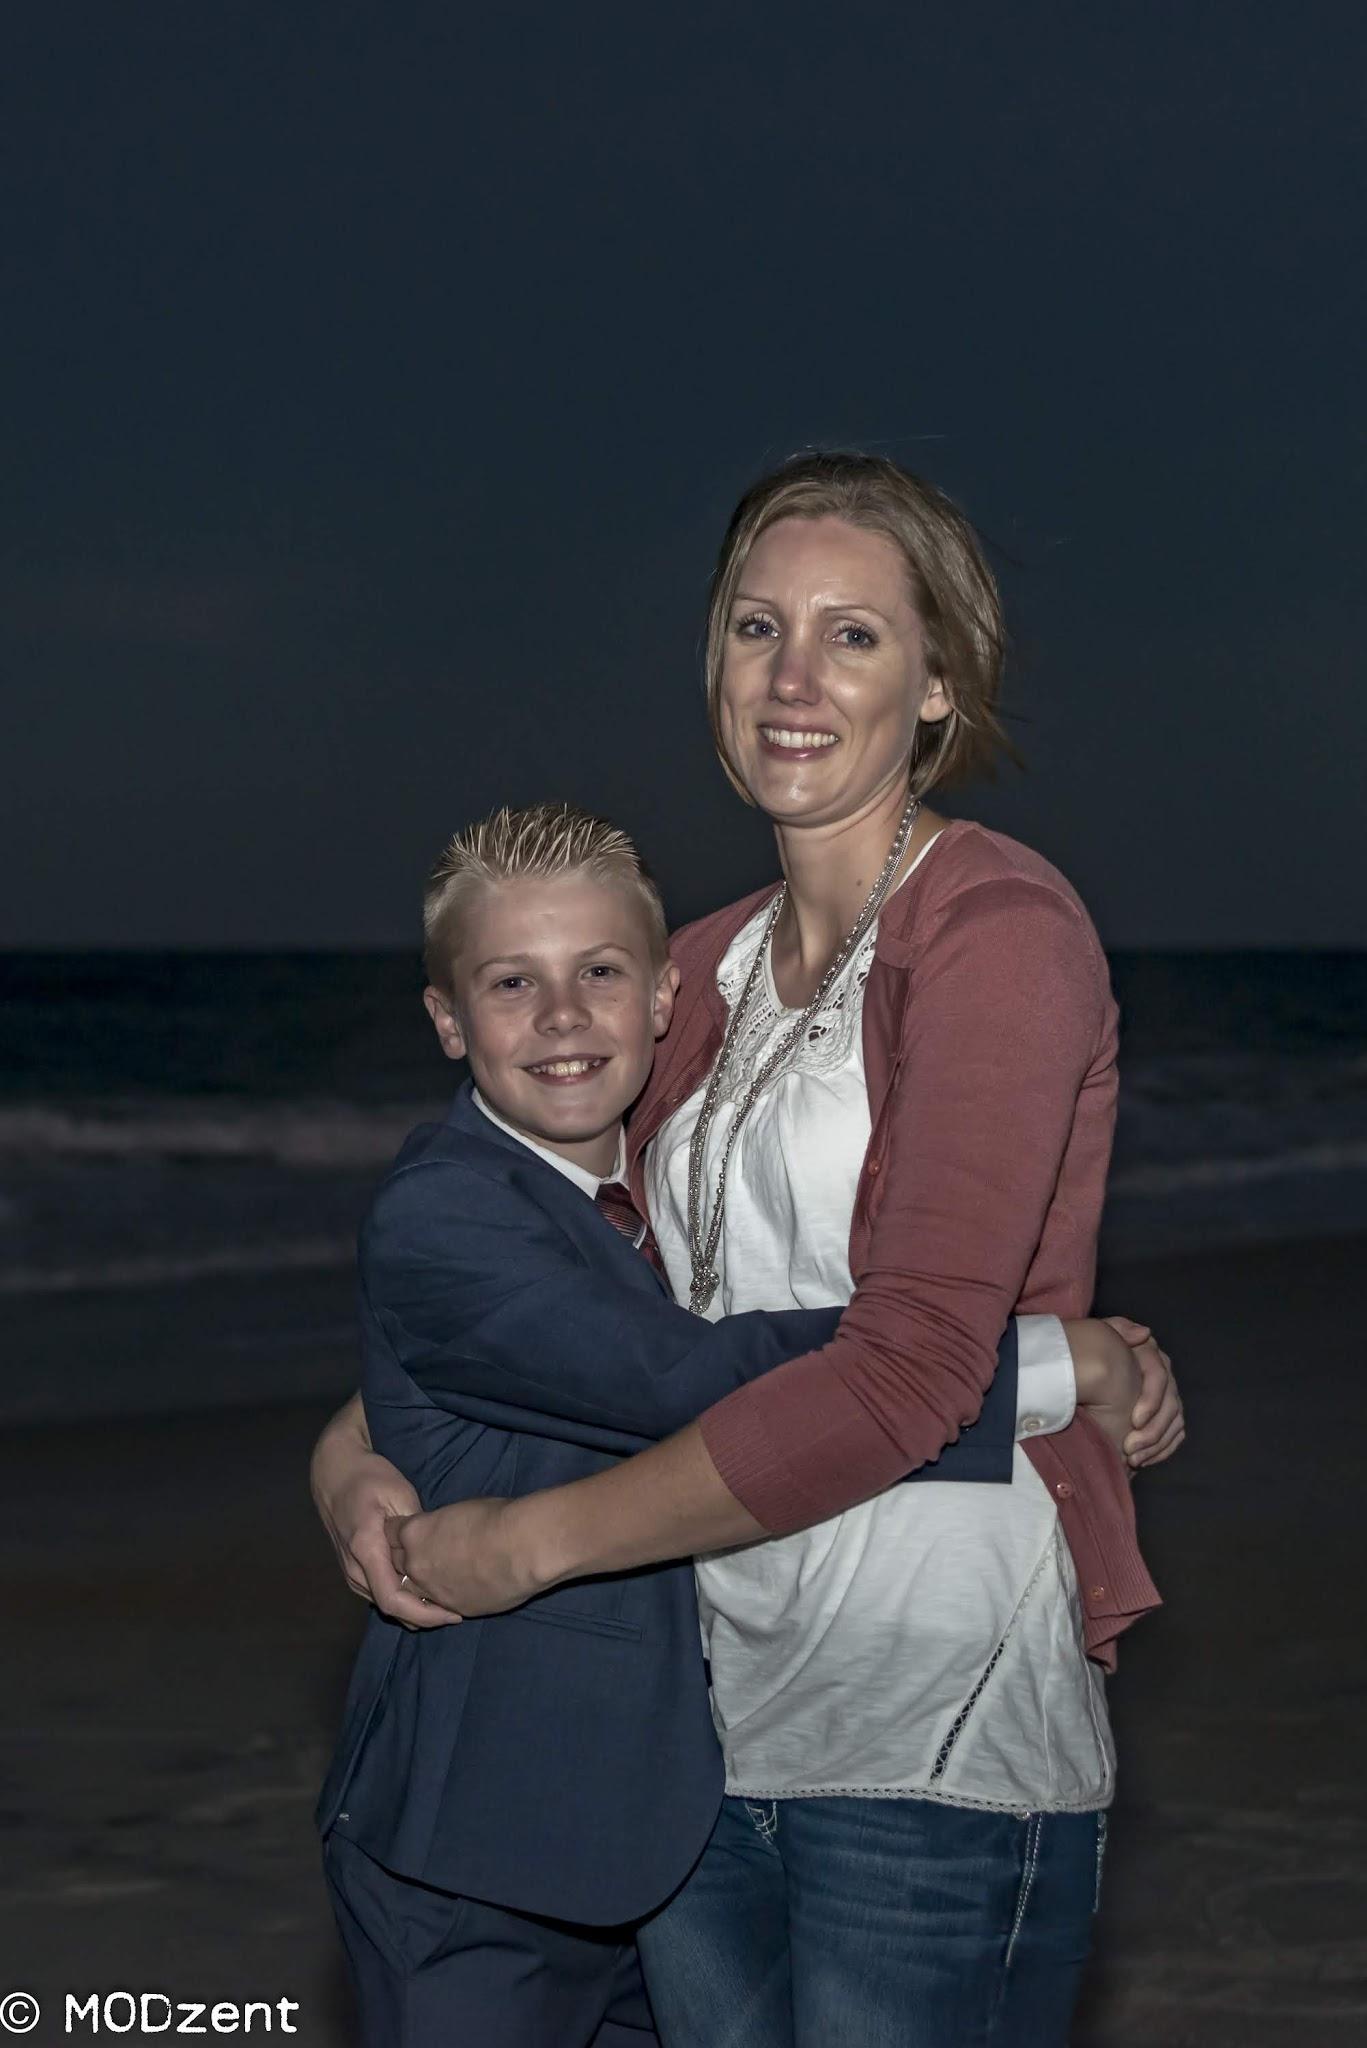 November 3, 2018 Ellis Family at the Beach